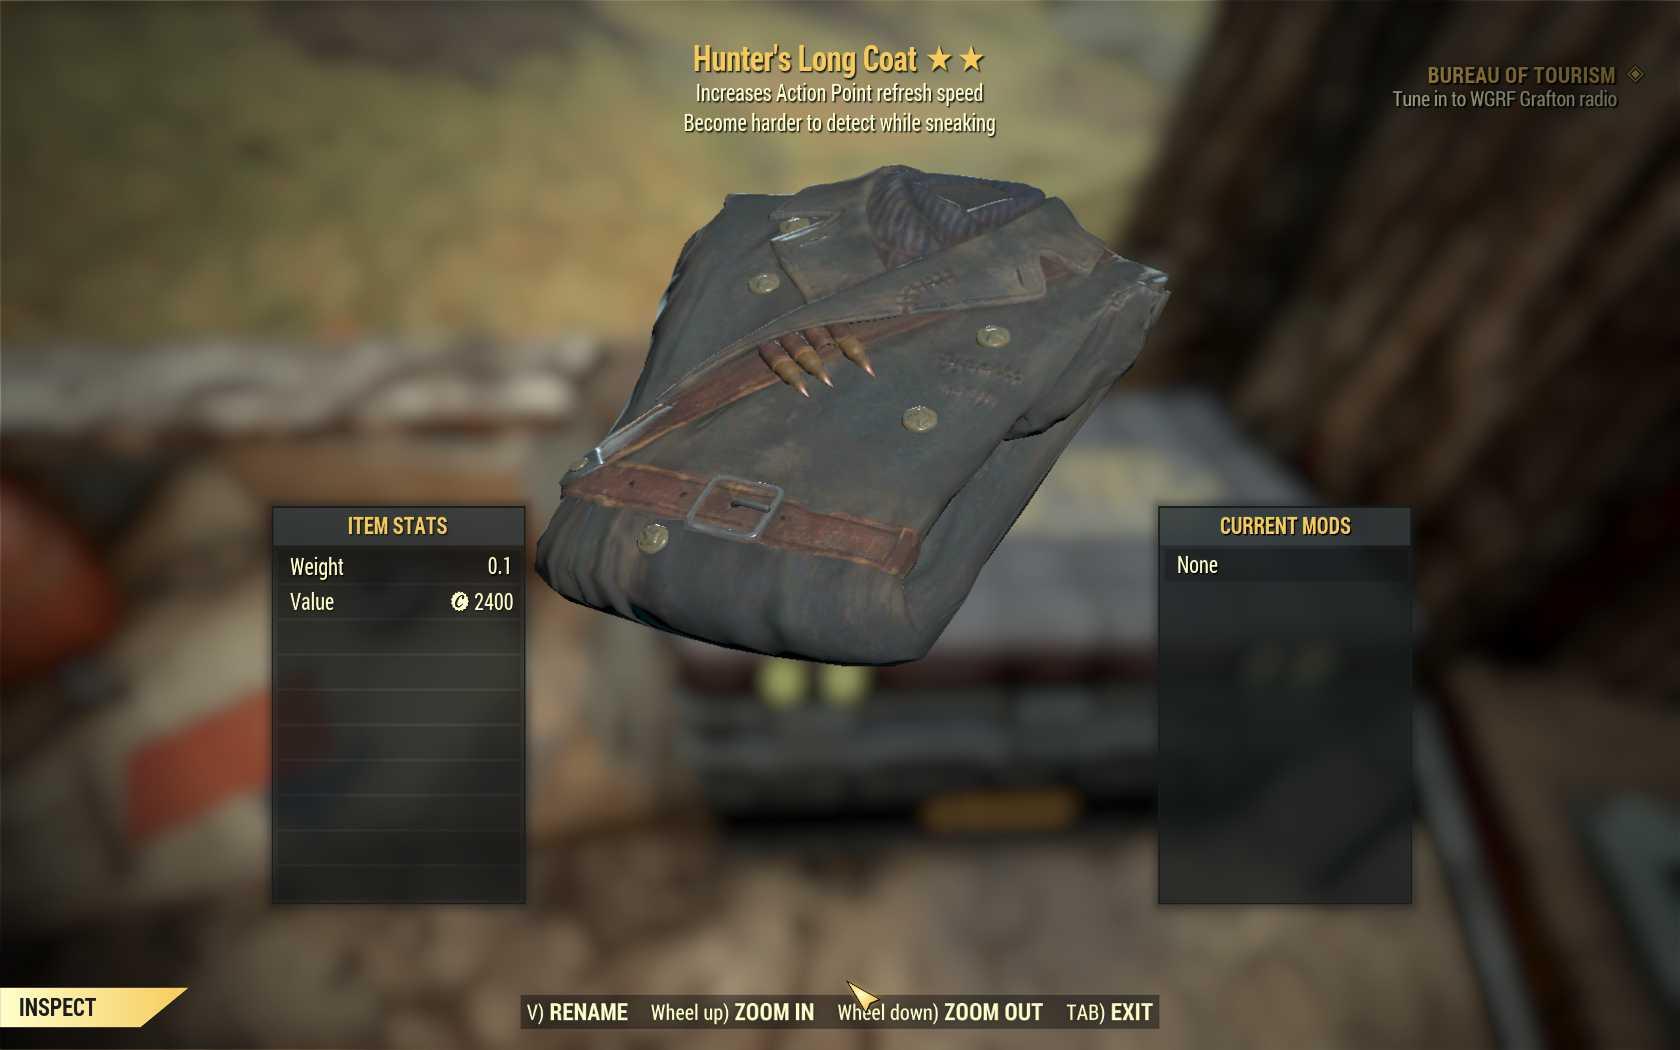 [Legendary Outfit] Sneak Hunter's Long Coat (AP REFRESH)